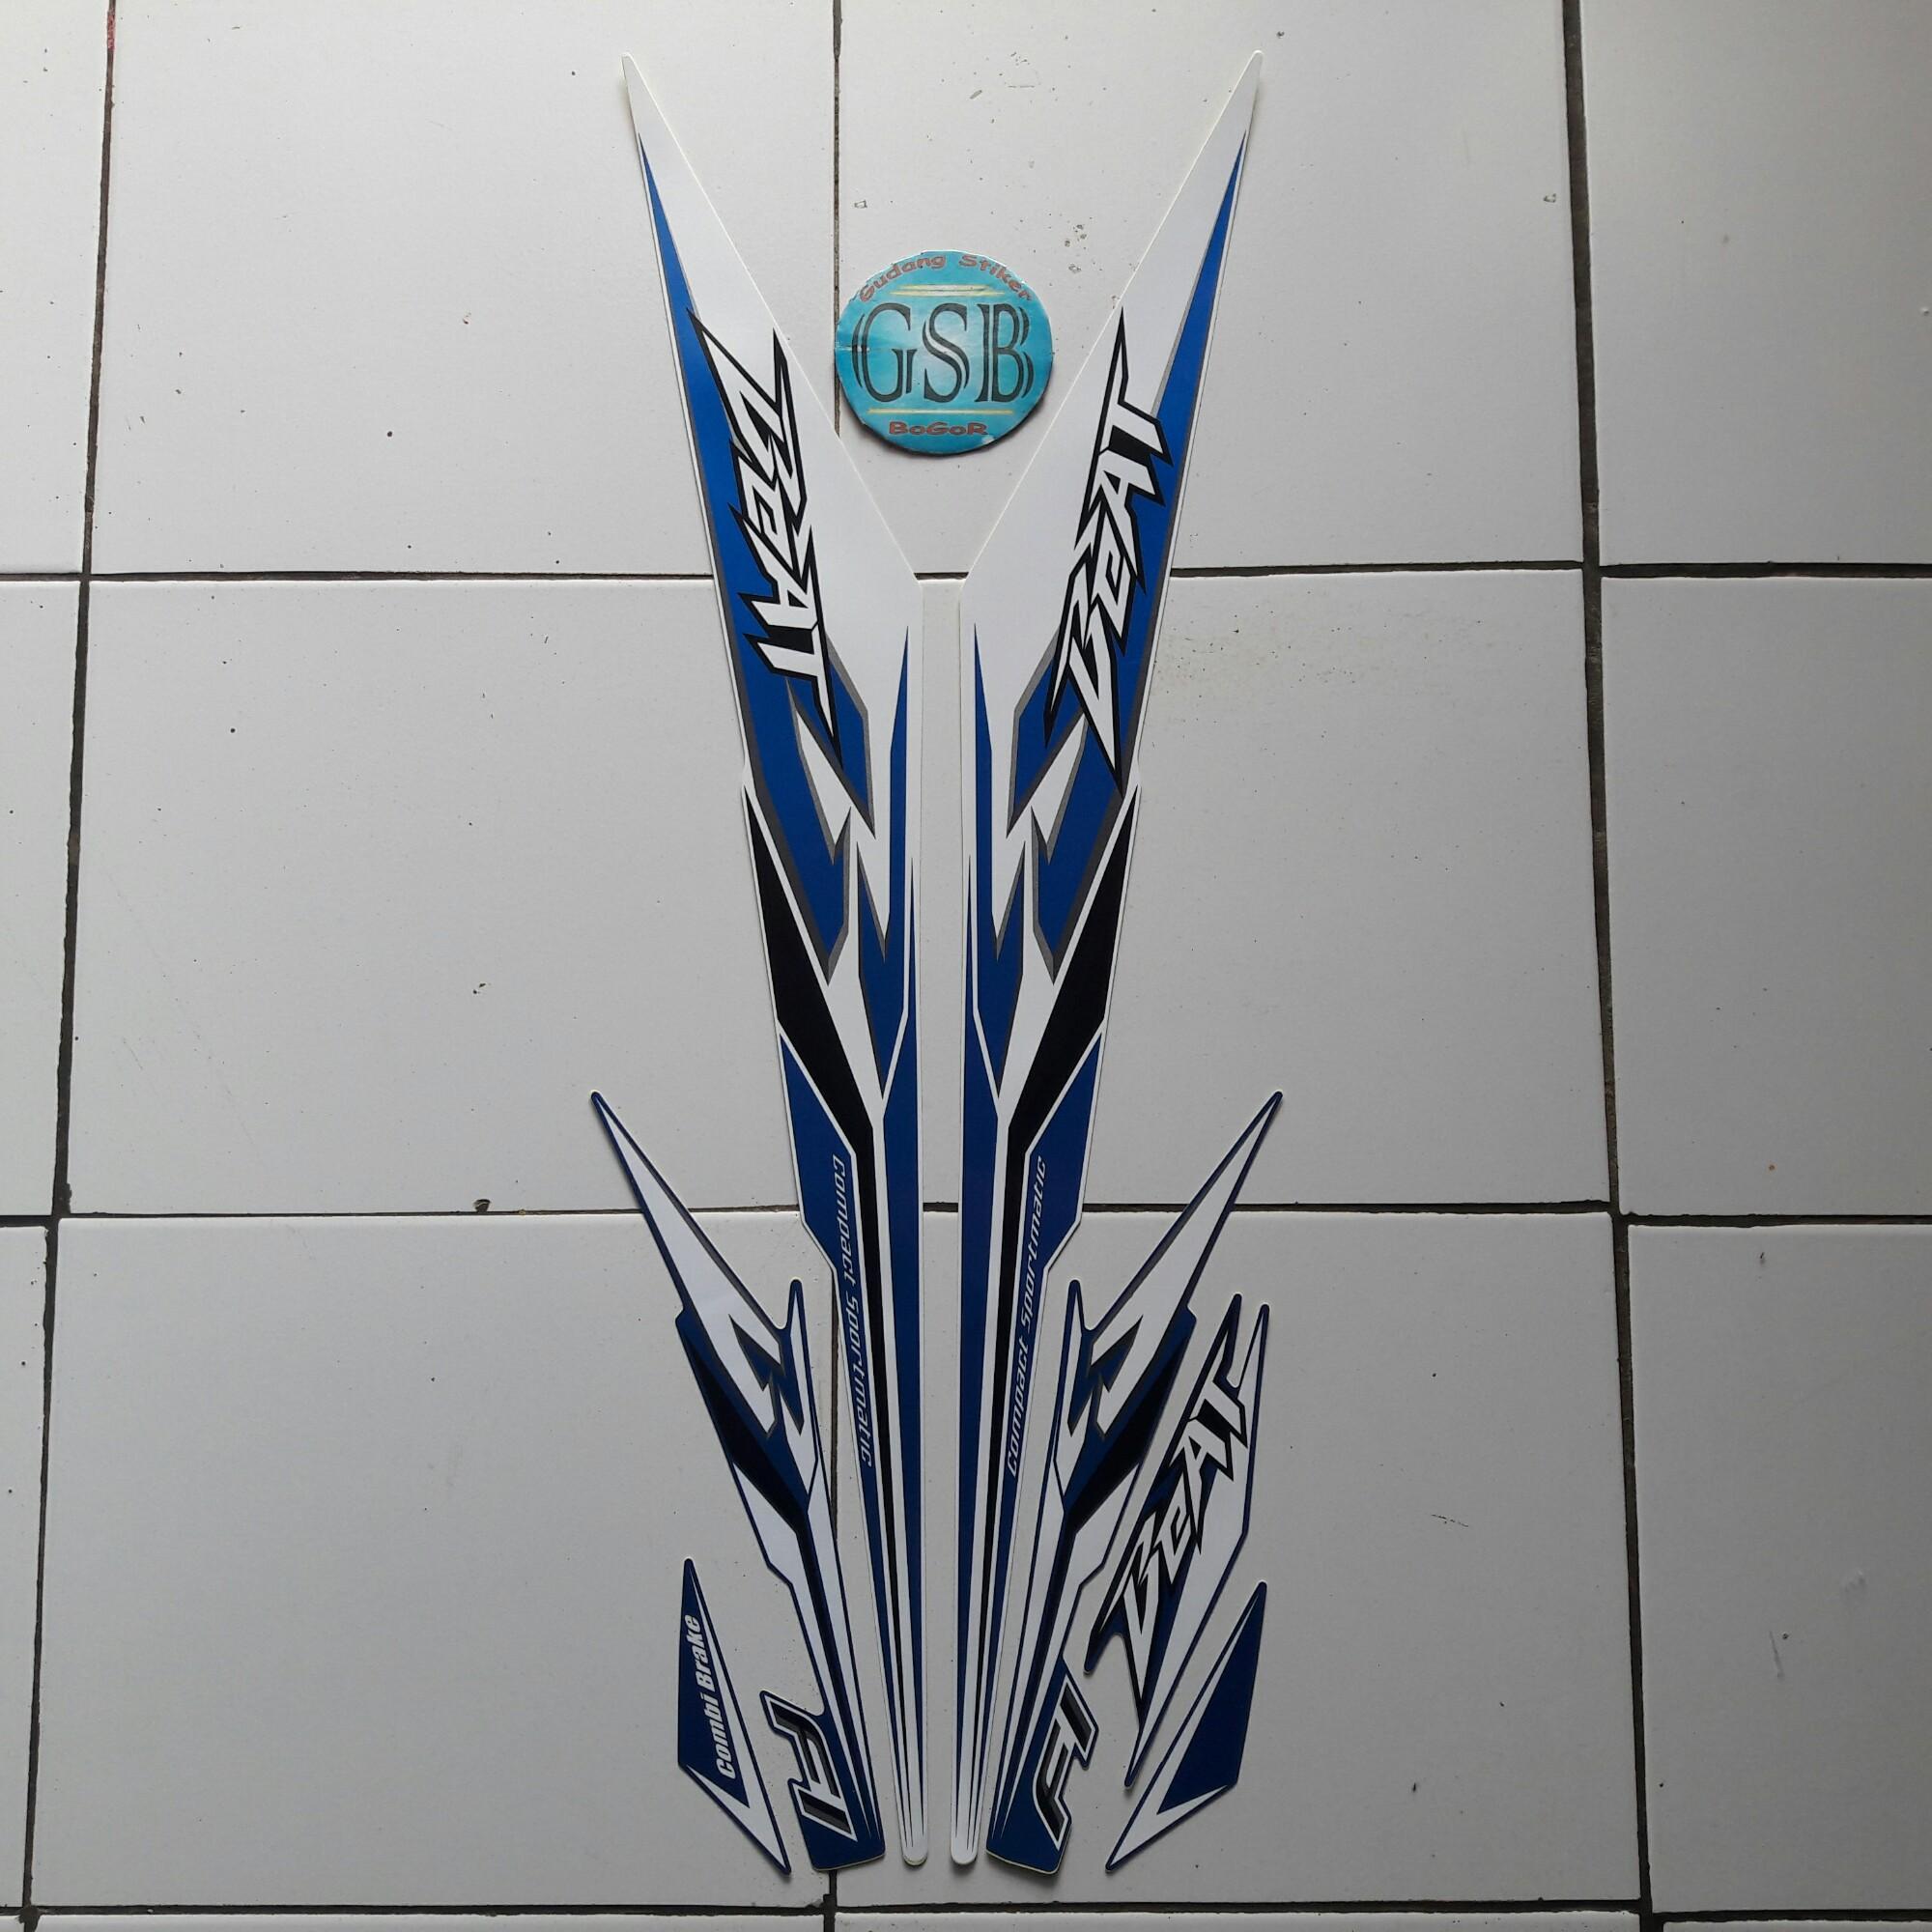 Kelebihan Cover Motor Honda Beat Sporty Cbs Iss Biru Terkini New Vario 110 Esp Grande White Jakarta Stiker Striping Fi Thailand 2018 Putih